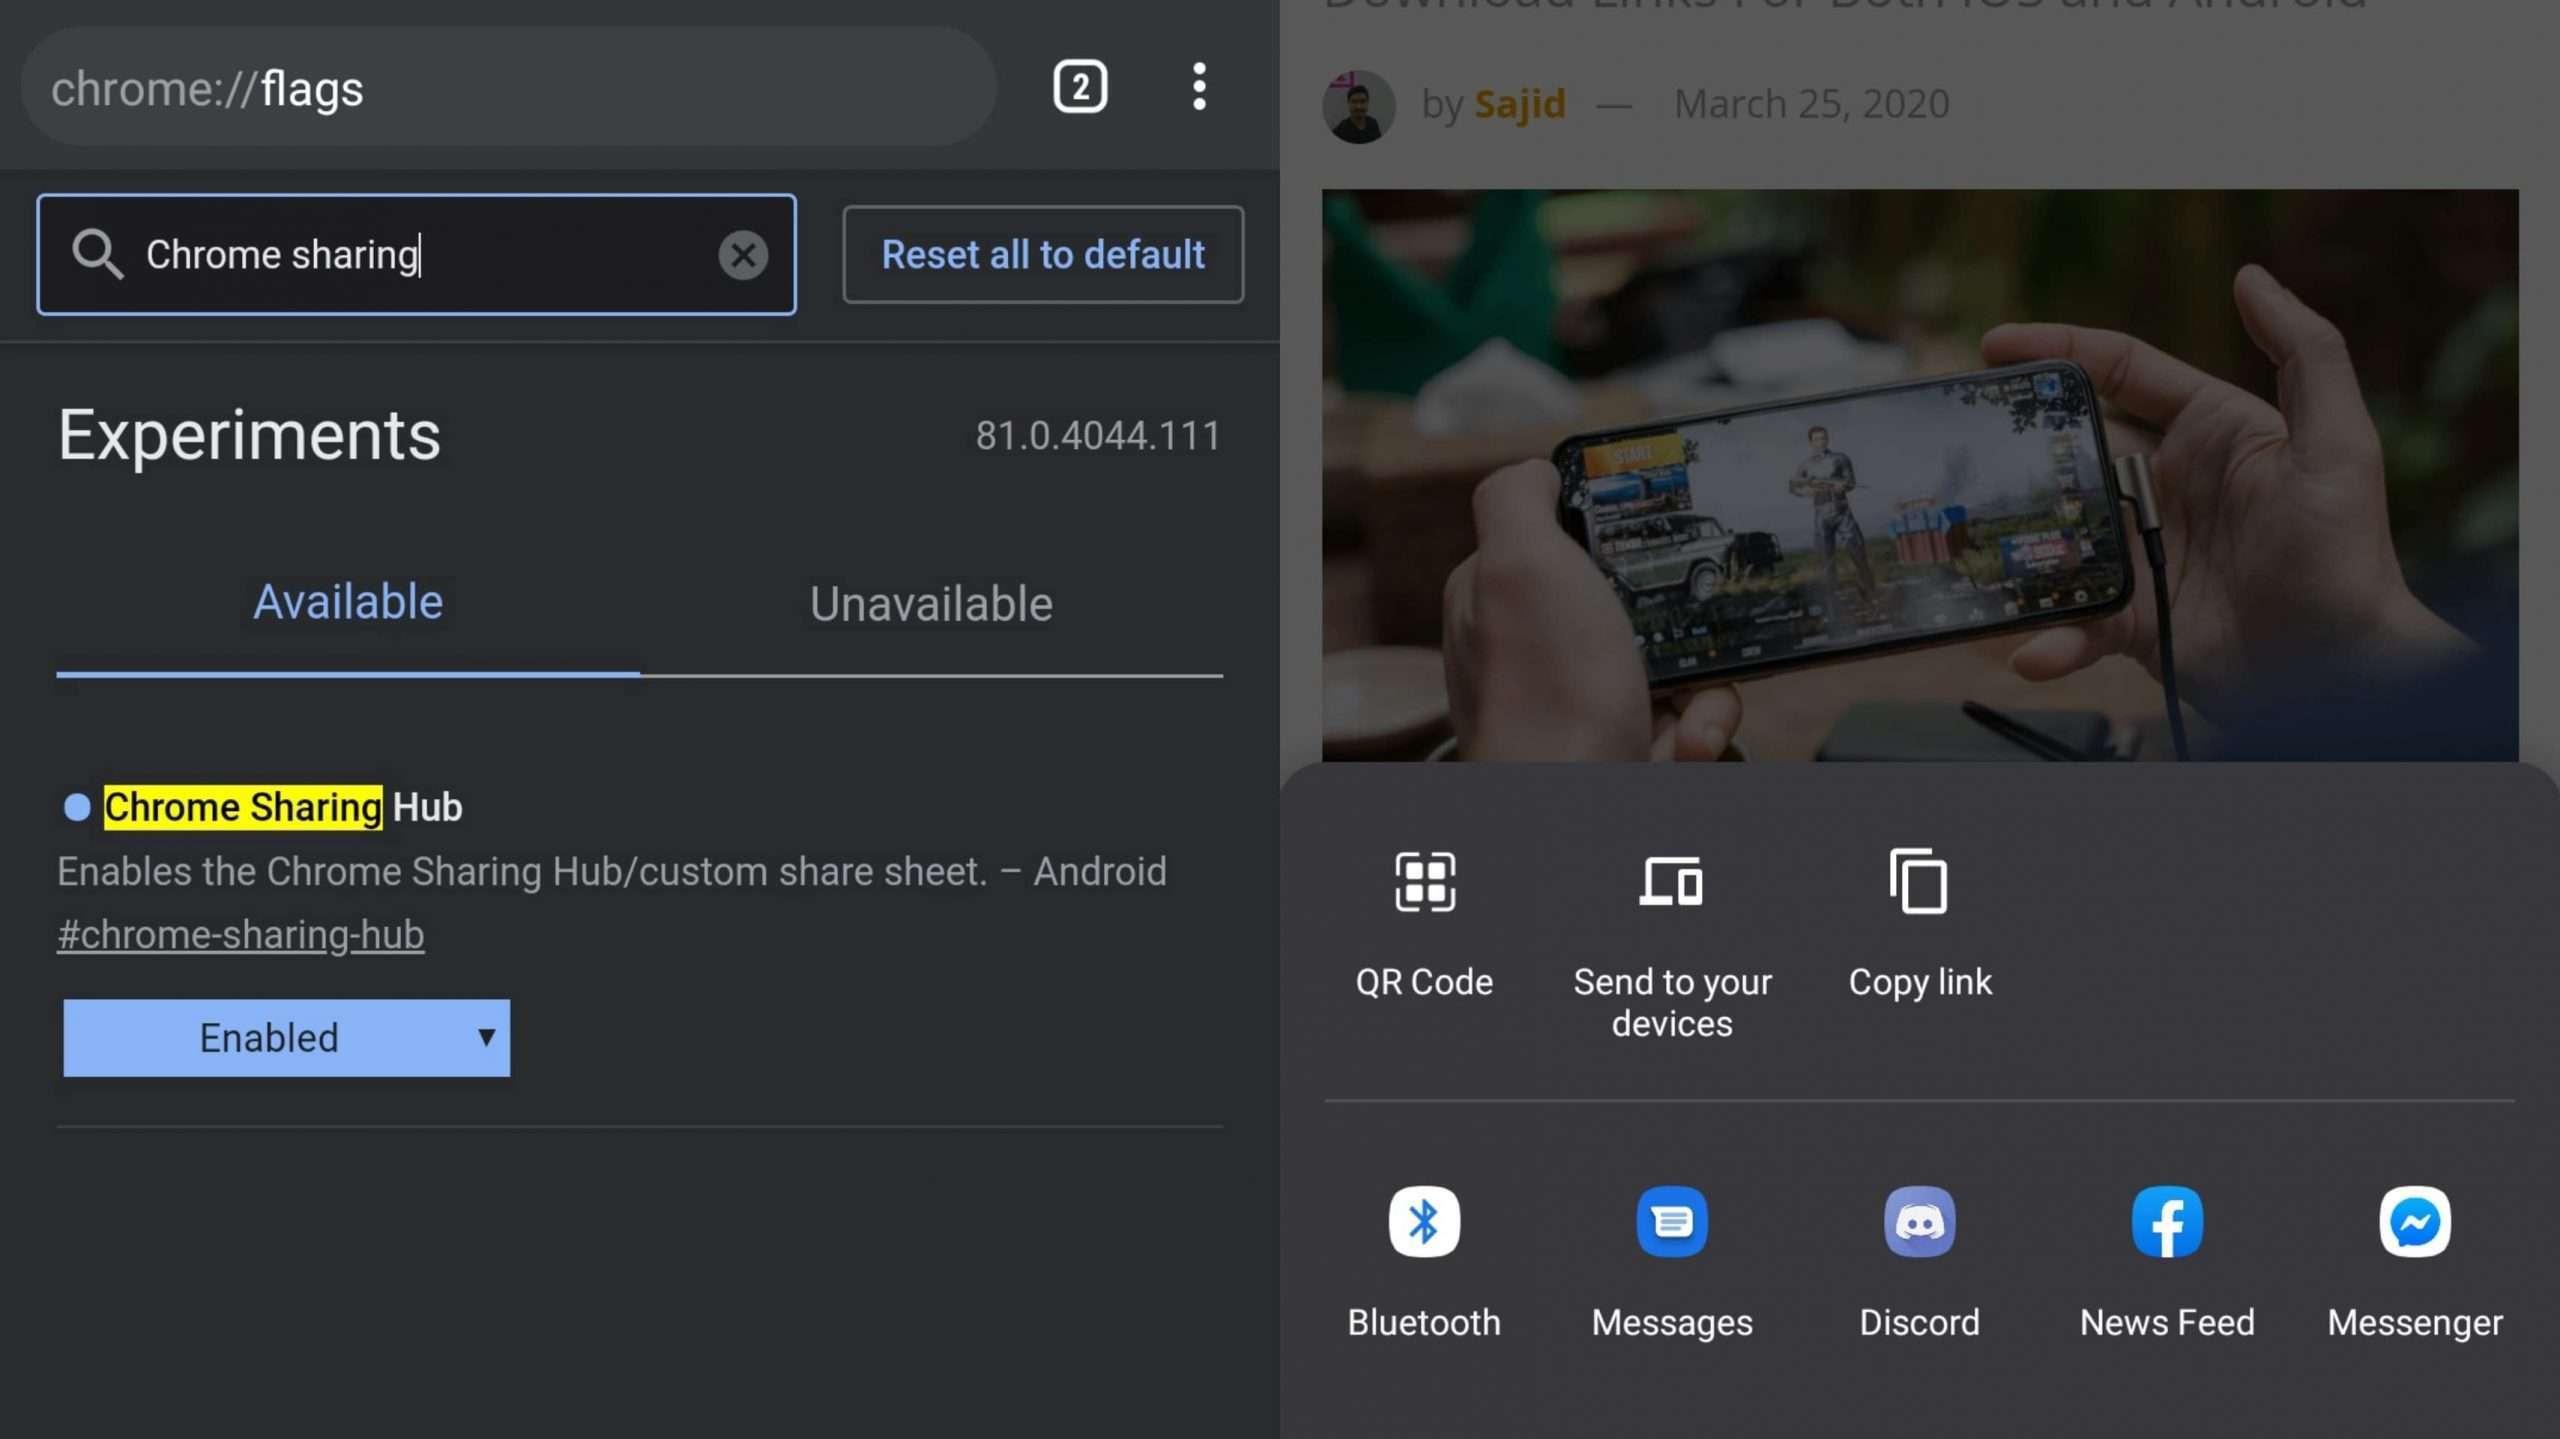 Chrome Sharing Hub - Best Google Chrome Flags Android